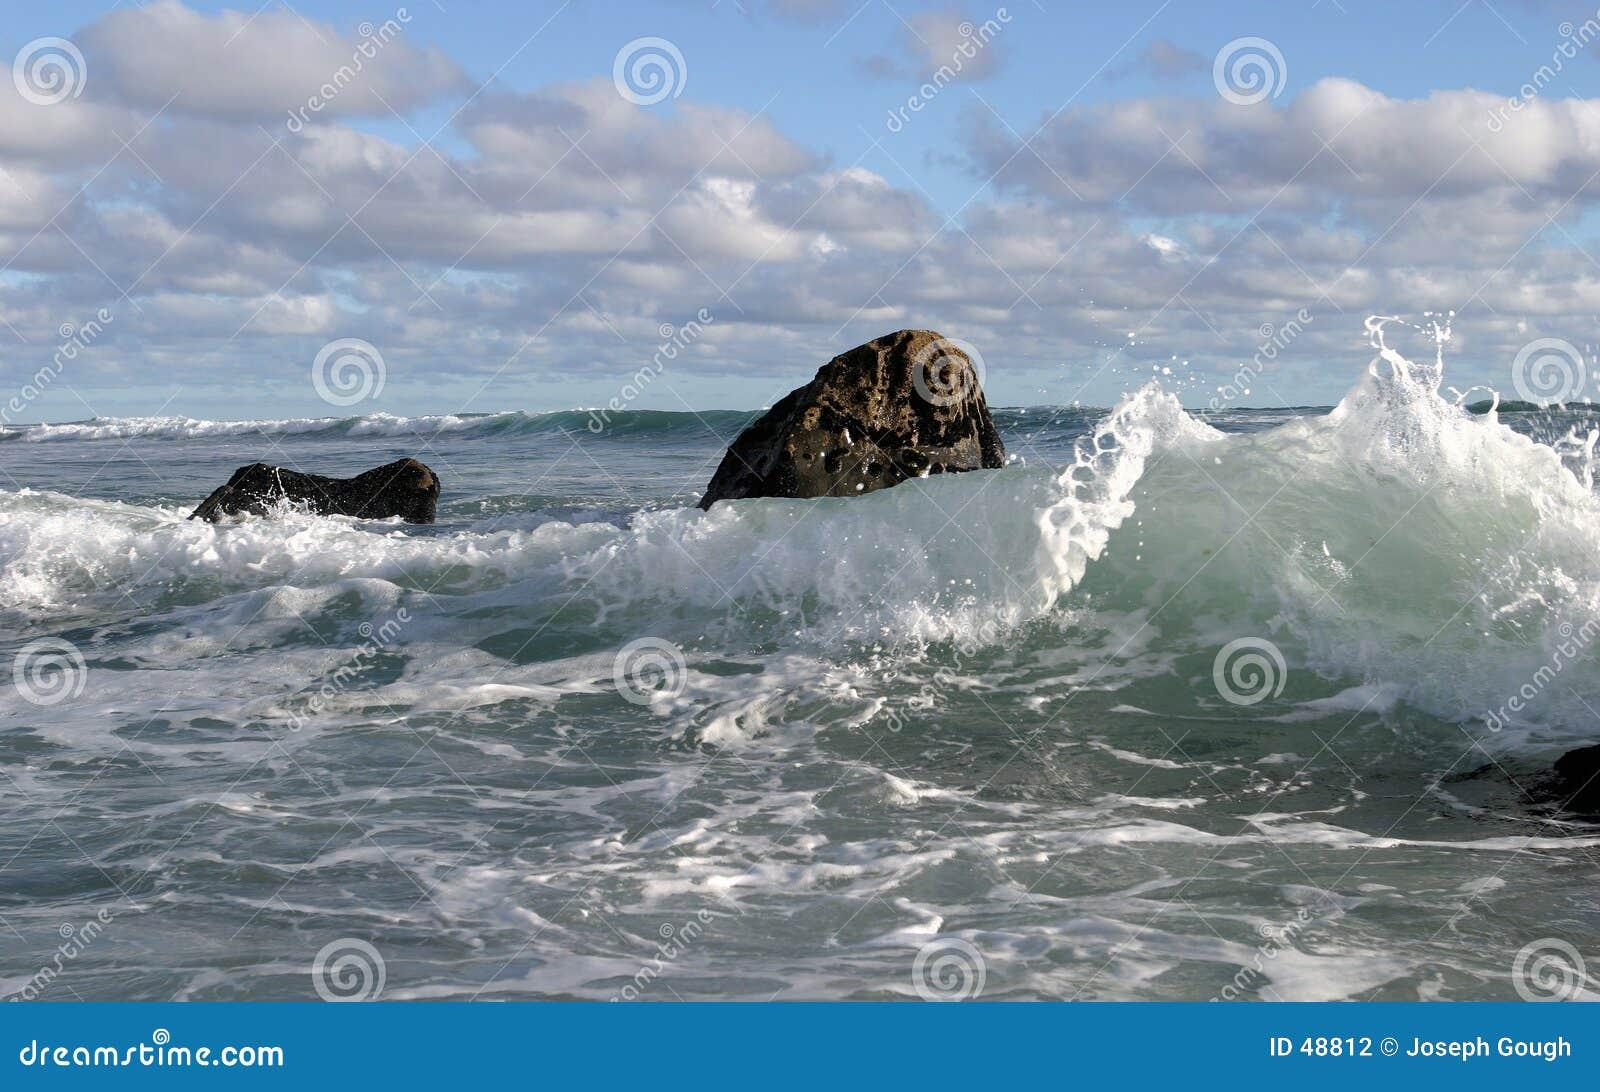 Surf & Clouds 3